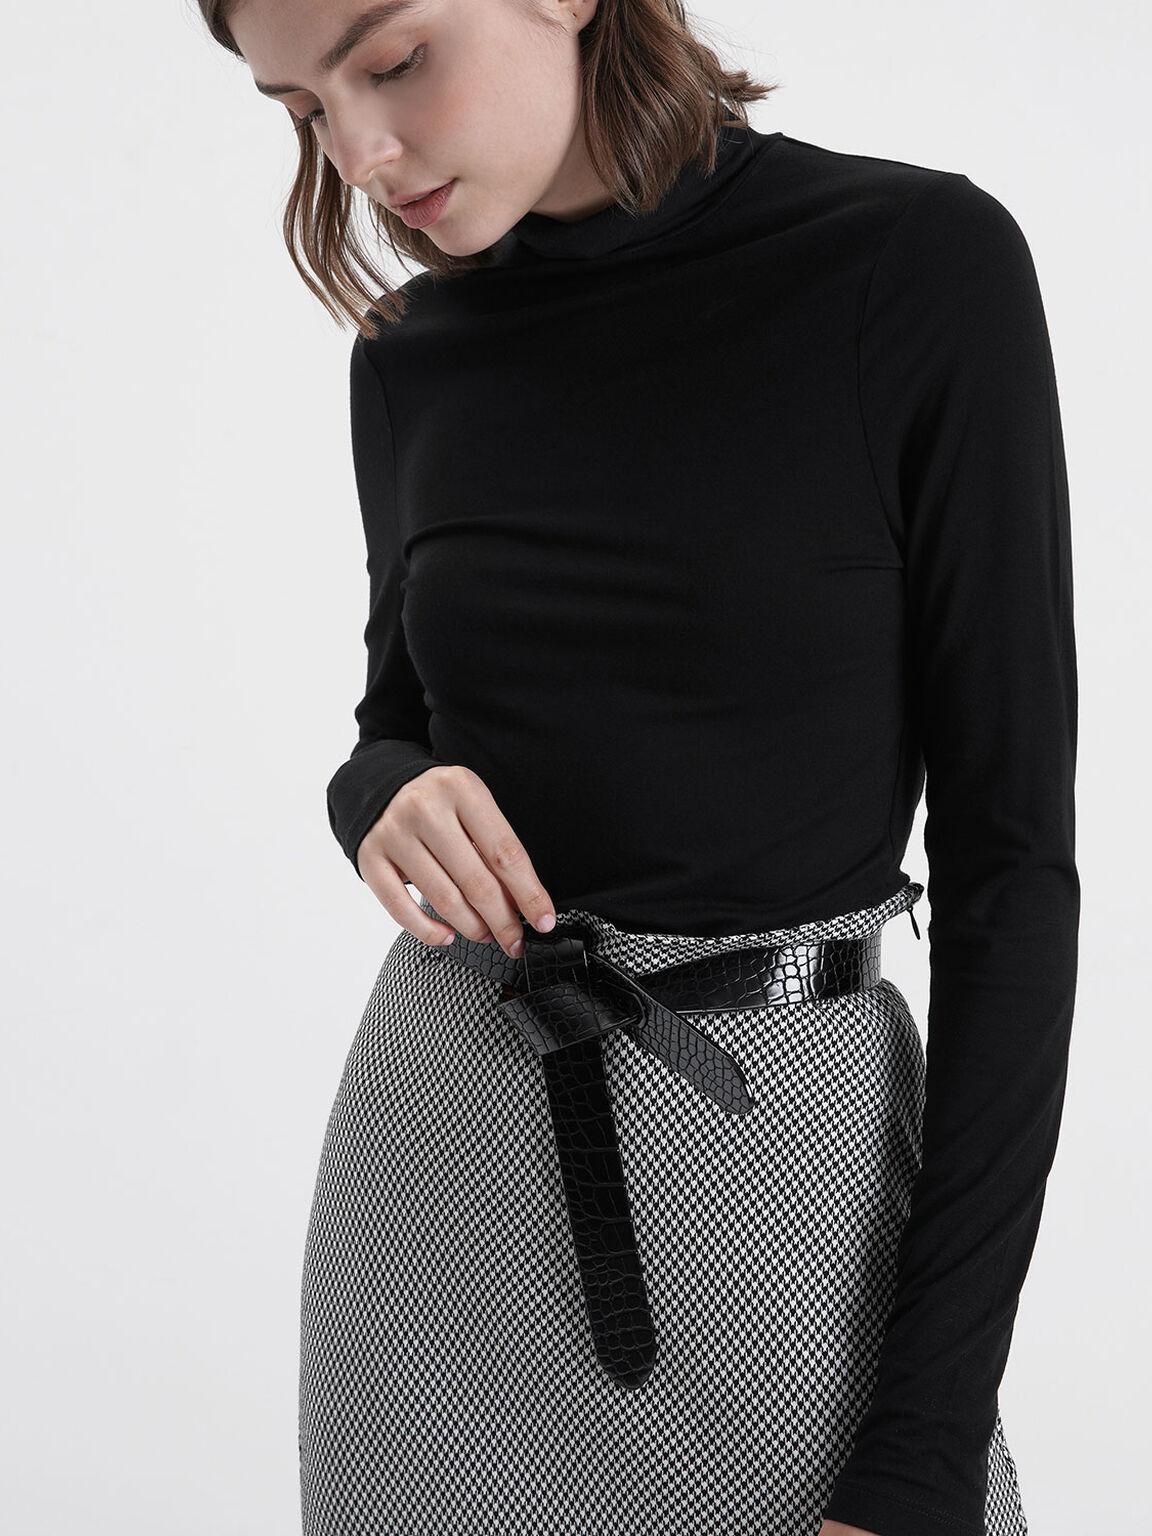 Croc-Effect Reversible Knot Belt, Black, hi-res